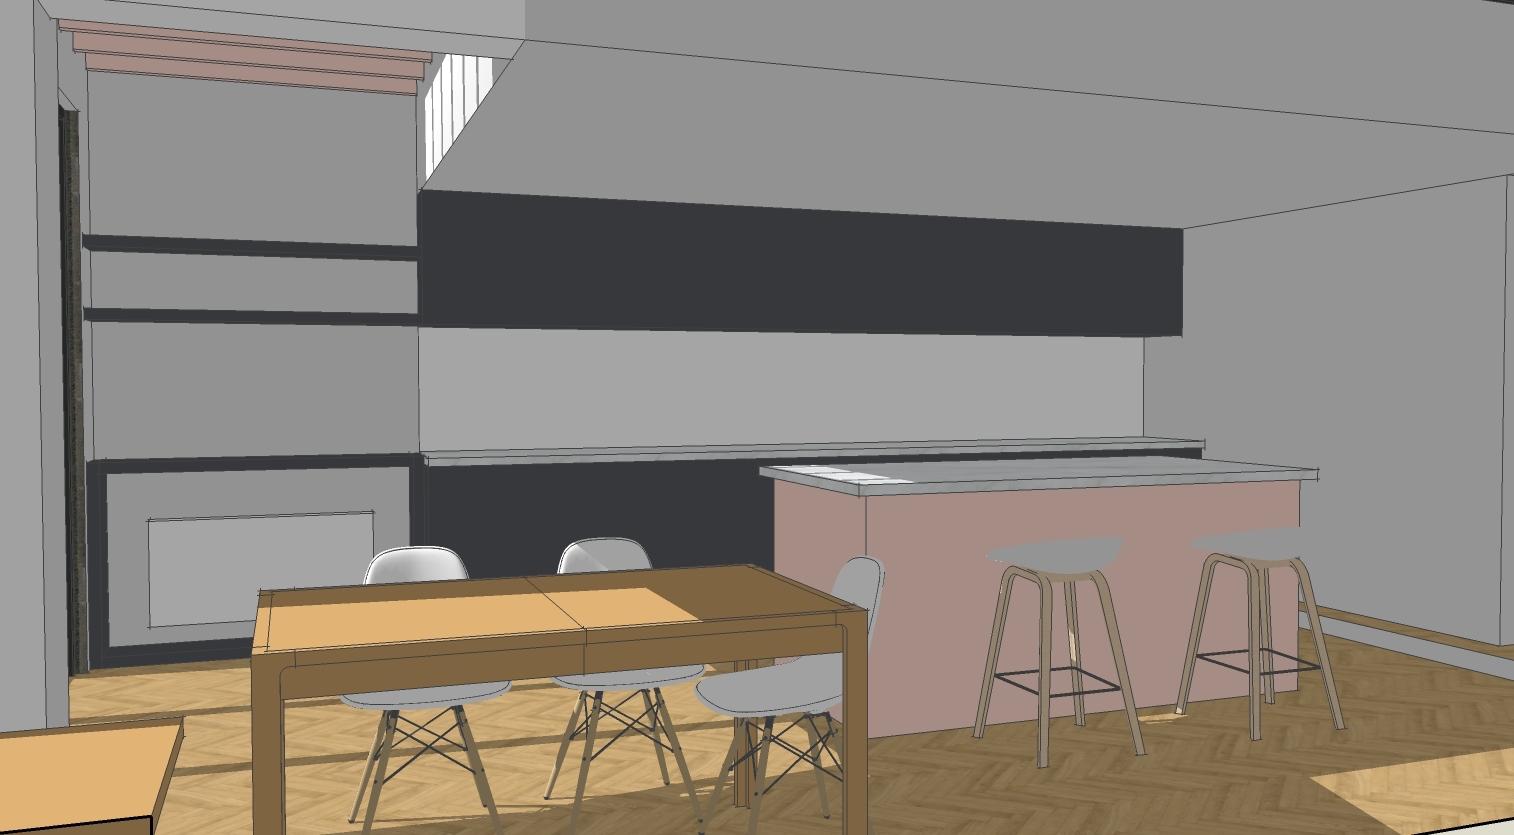 Sketch view of open plan kitchen